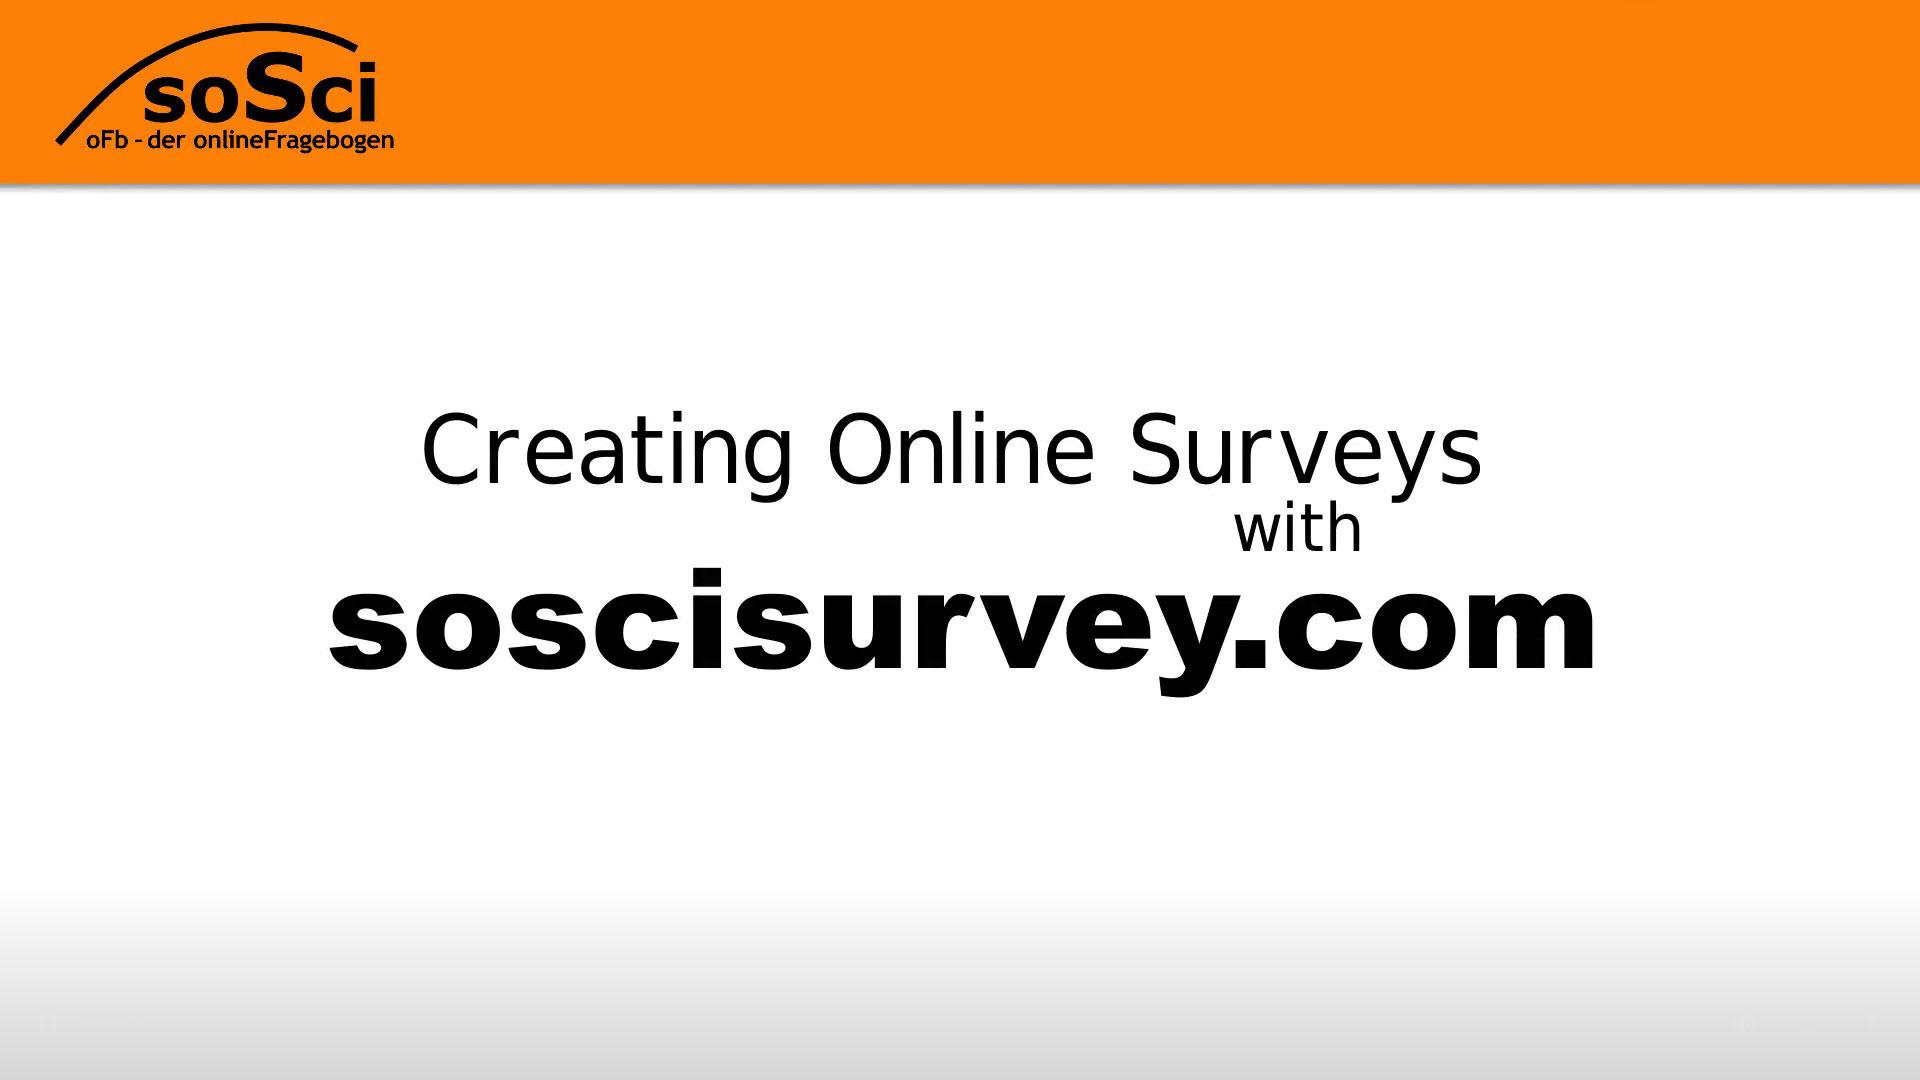 SoSci Survey